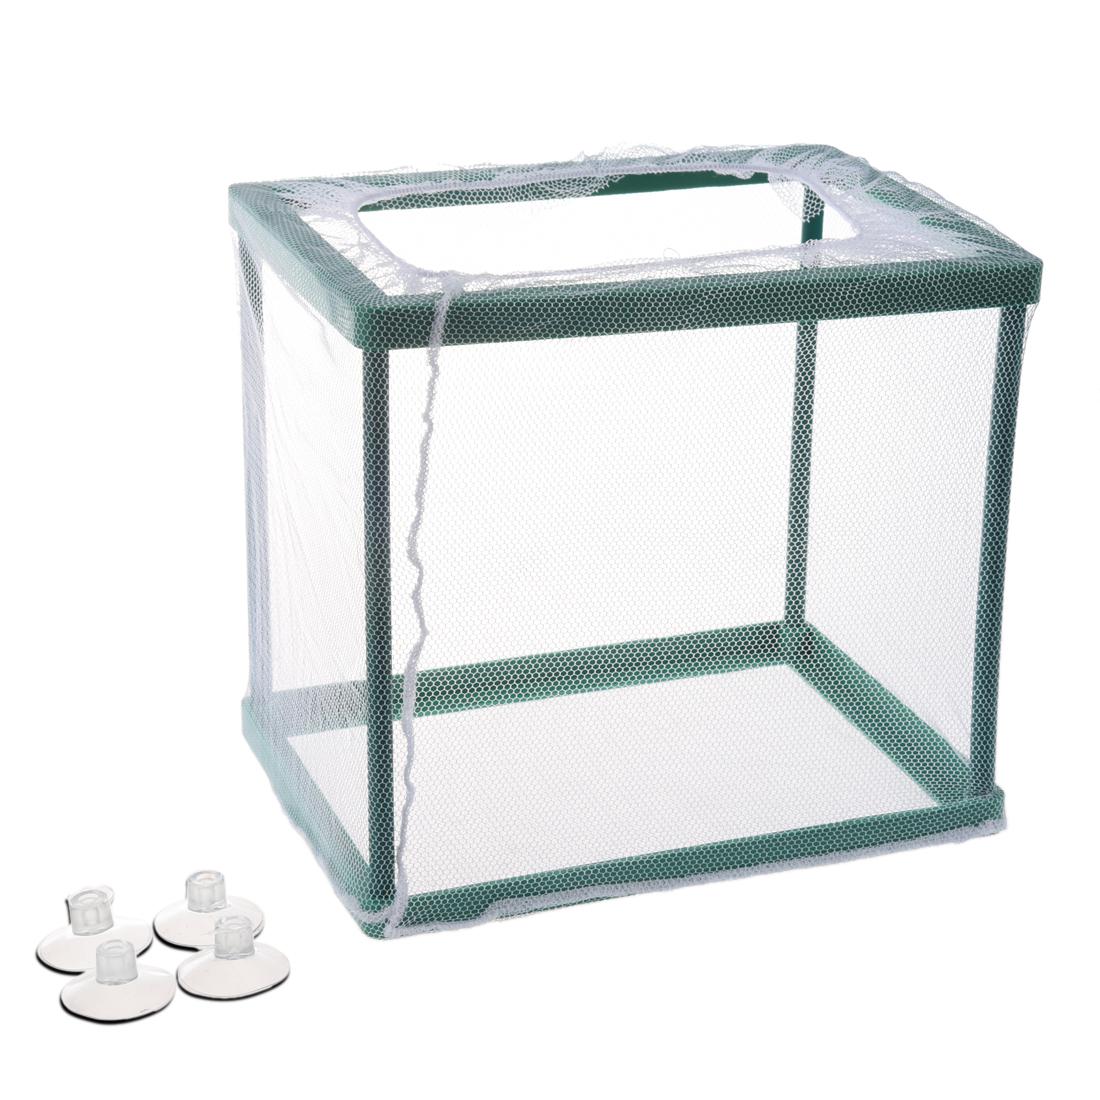 Aquarium fish tank fry net breeder breeding hatchery -